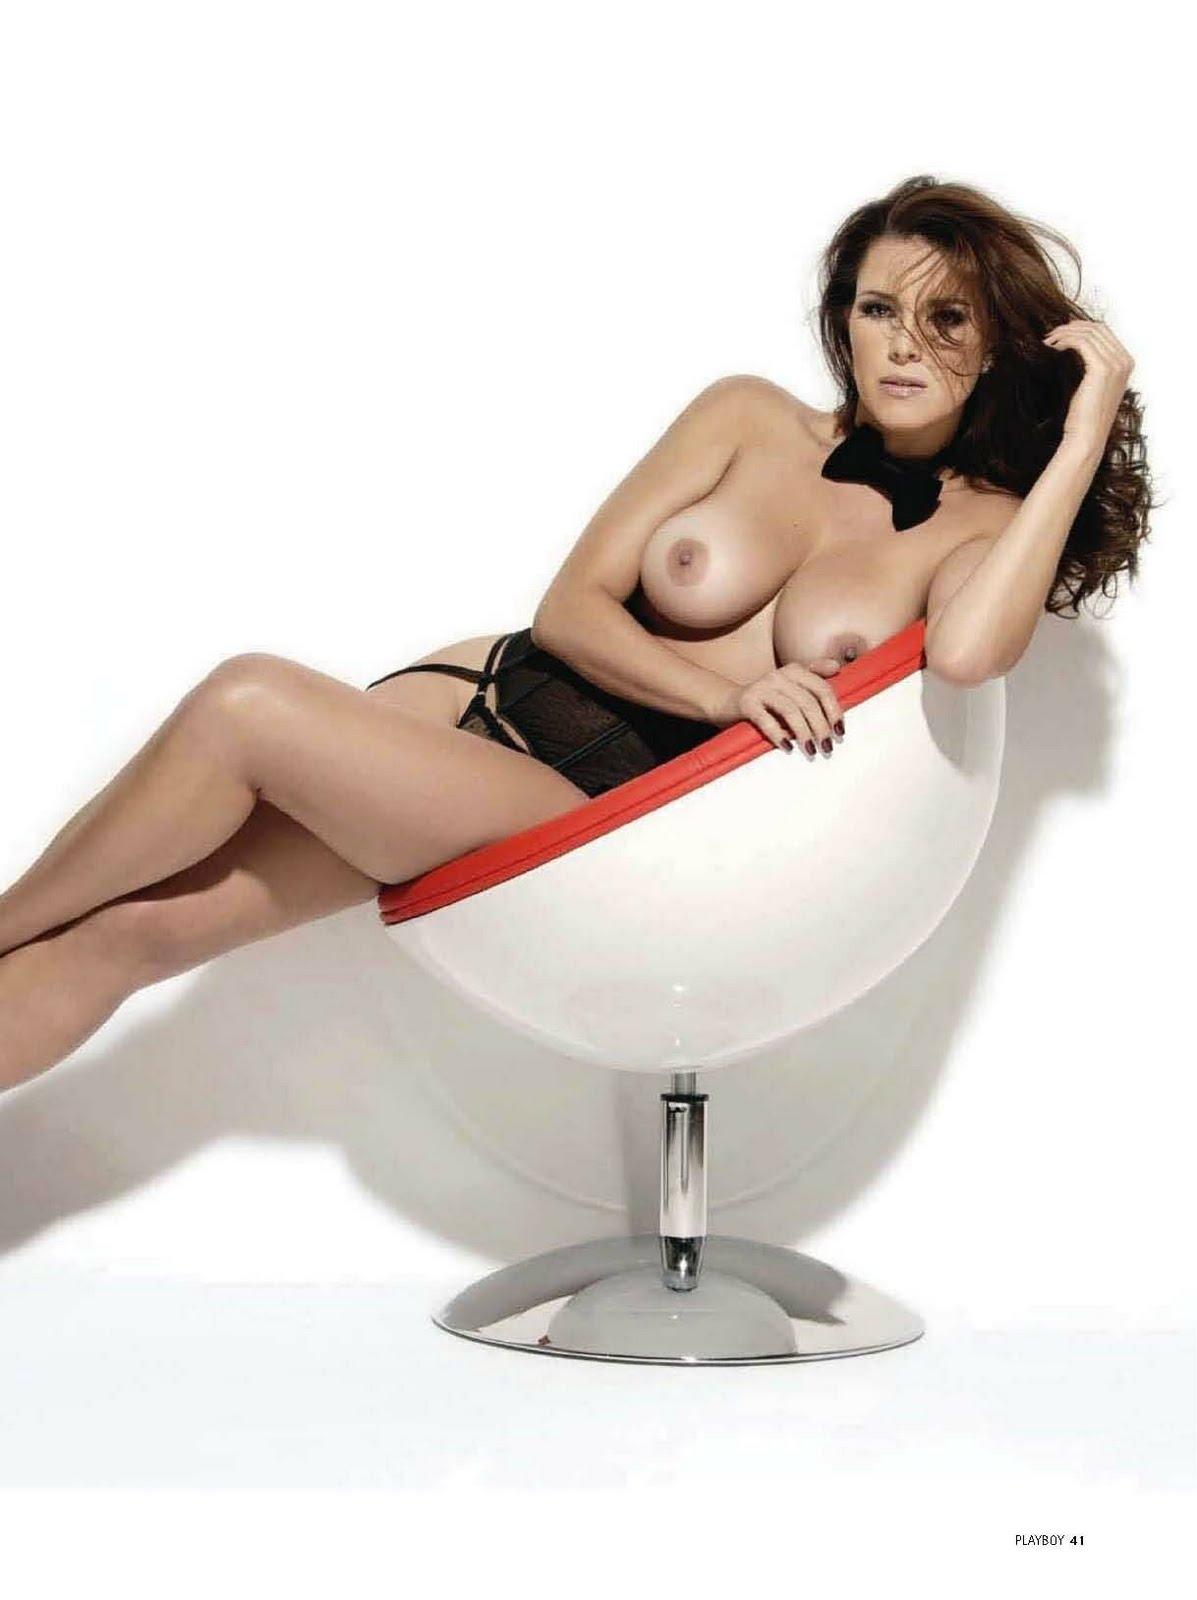 Alicia coppola naked